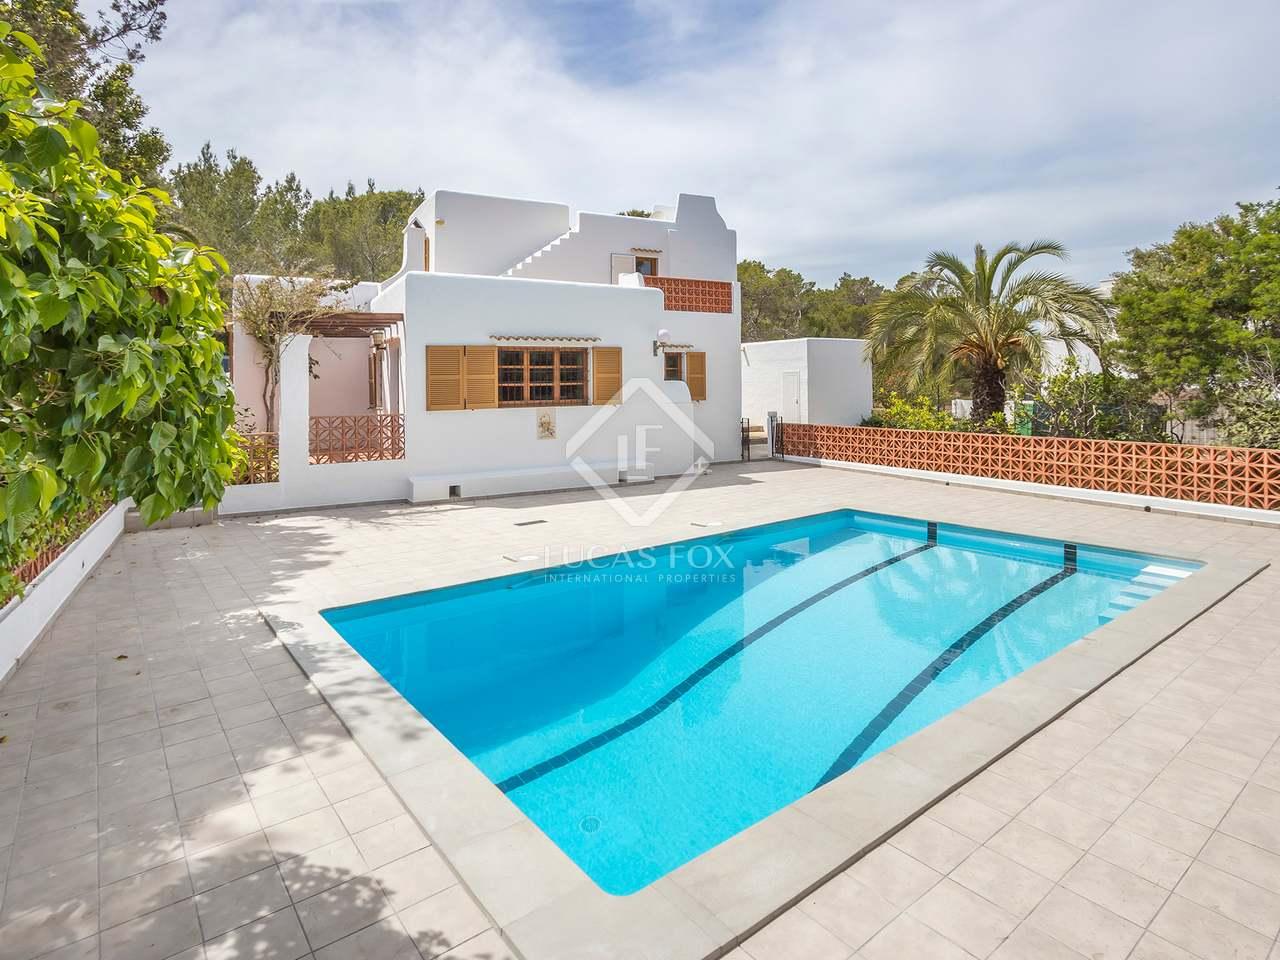 99m haus villa zum verkauf in cala xarraca san juan. Black Bedroom Furniture Sets. Home Design Ideas